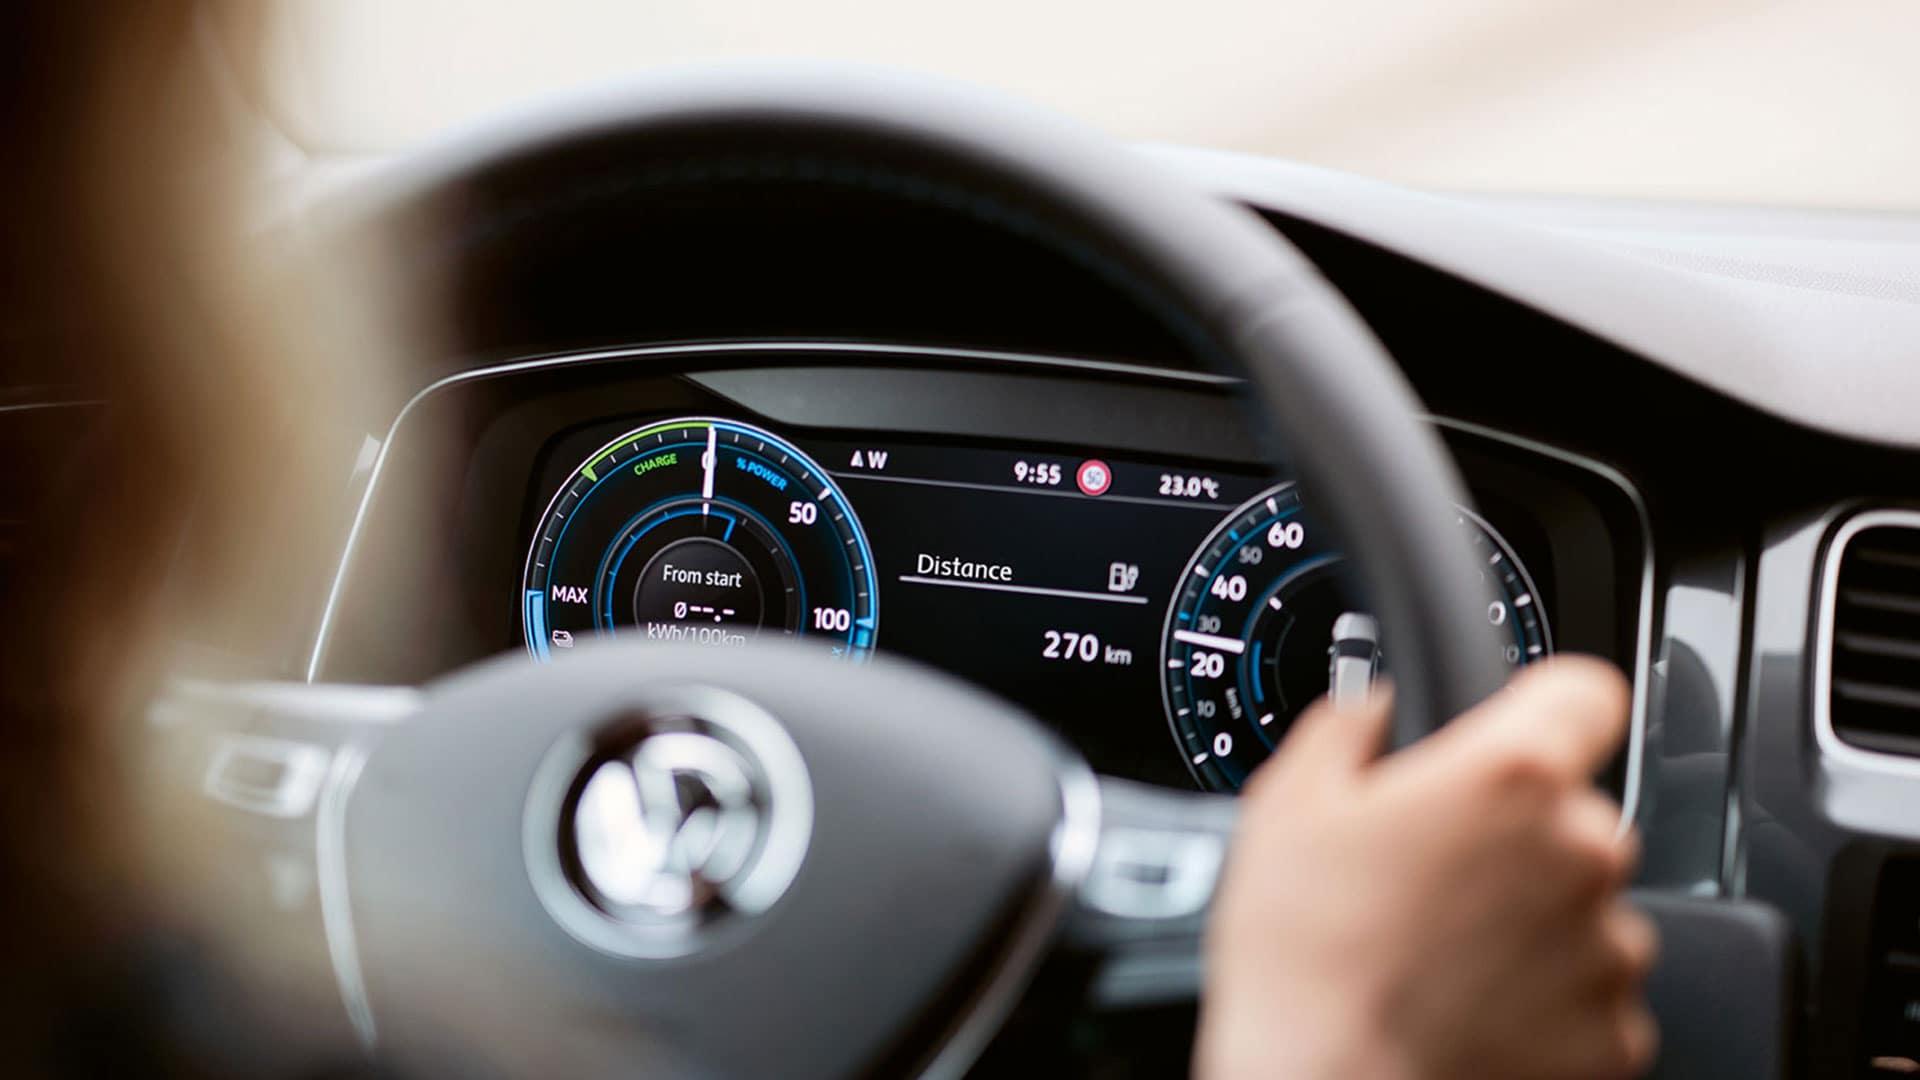 2019 VW e-Golf digital cockpit